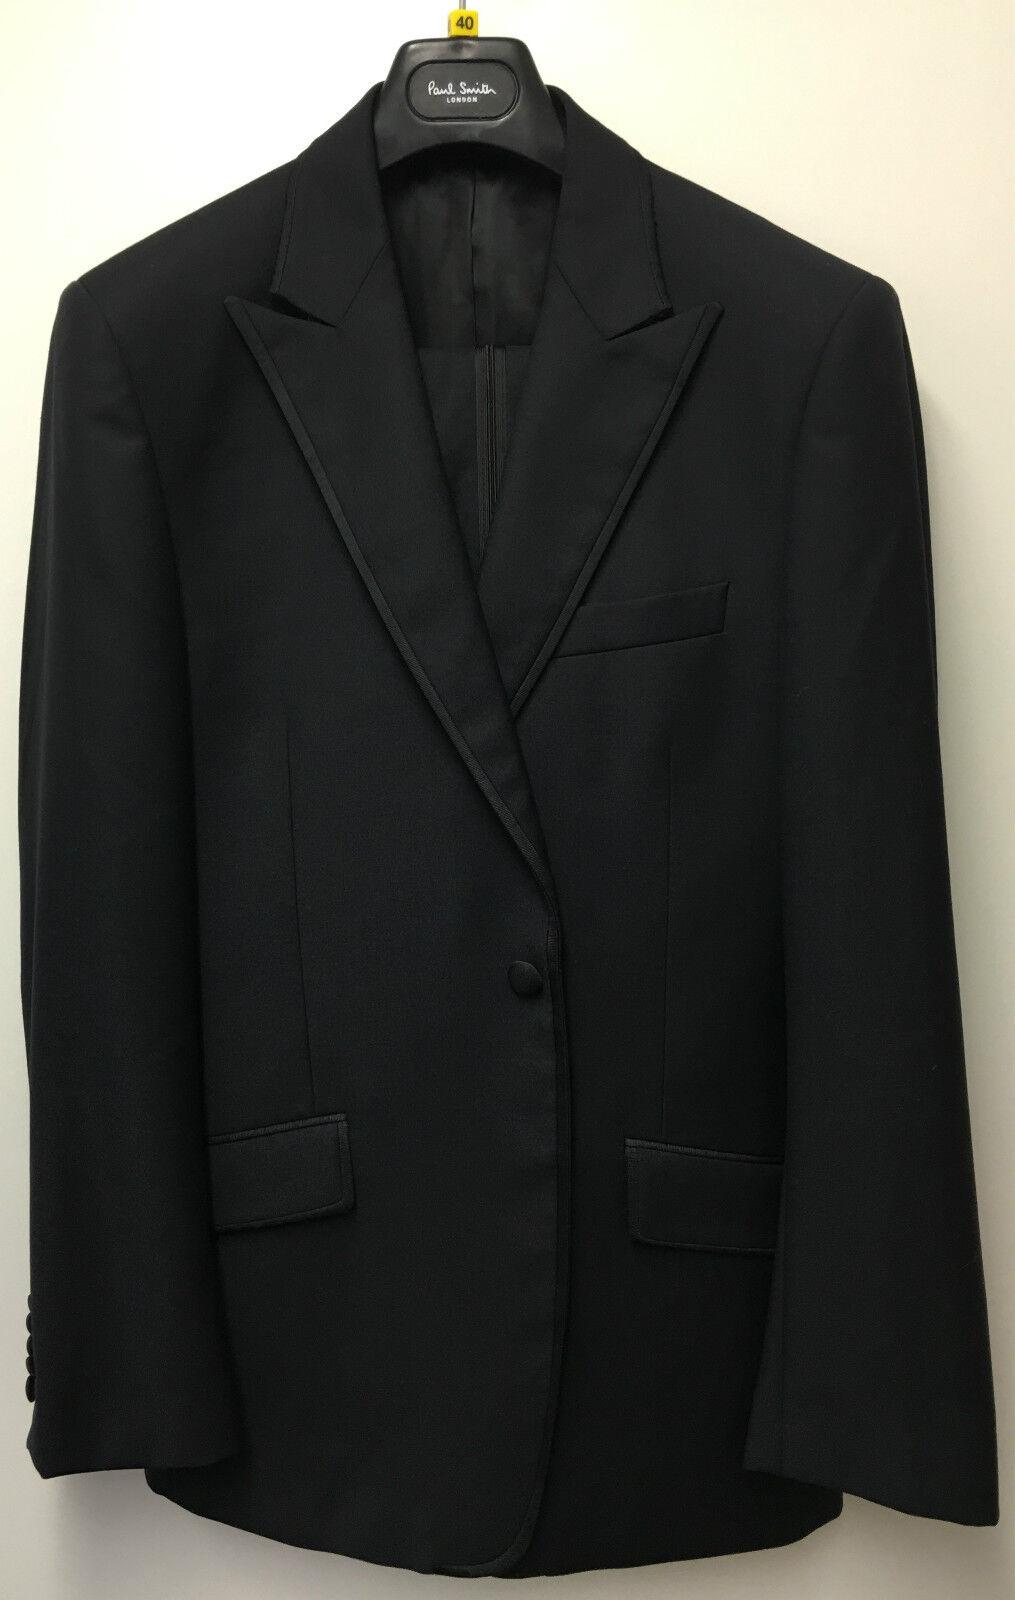 Paul Smith Evening Suit BYARD TailoROT Fit Wool & Mohair UK40R EU50R